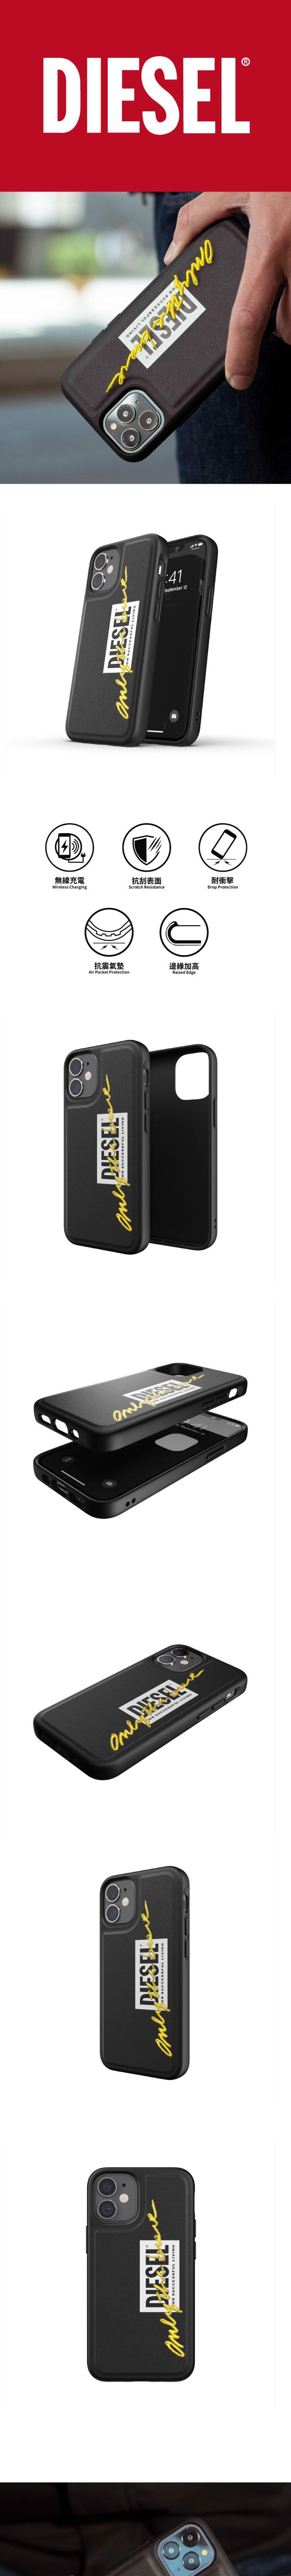 Diesel|iPhone 12 mini 手機殼 經典刺繡